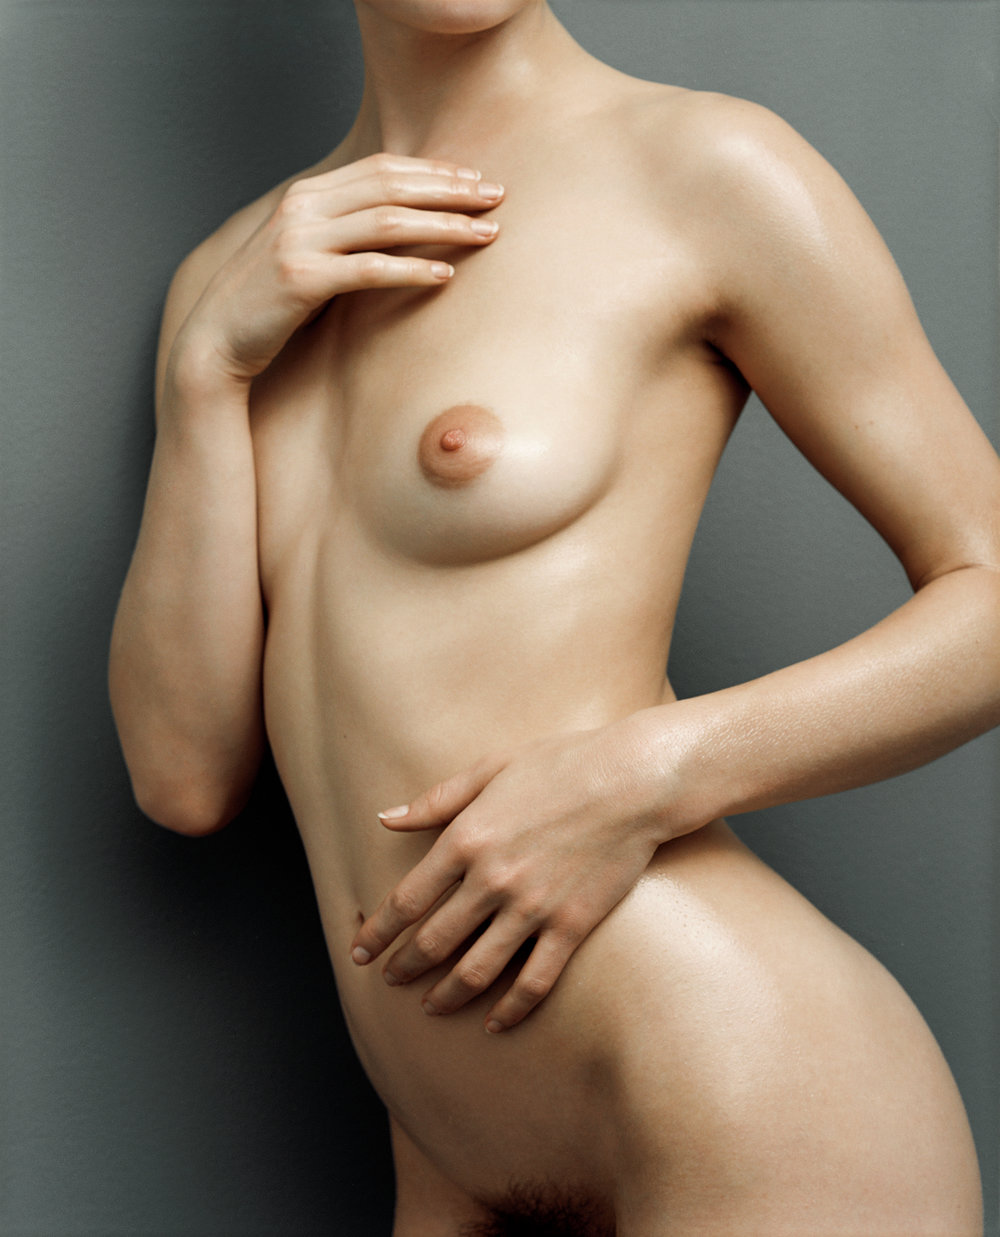 Large_Nude_flair_490822-9C_12.jpg